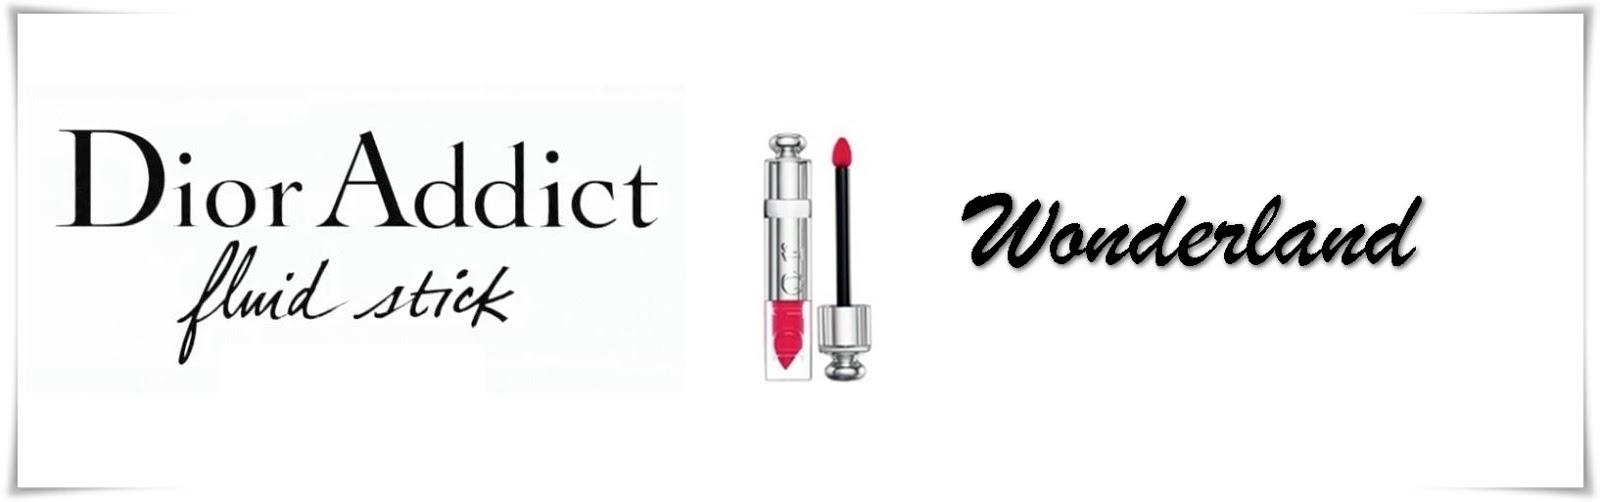 c74faf865b8b Golden Wendy - Le Blog  Dior Addict Fluid Stick, Wonderland